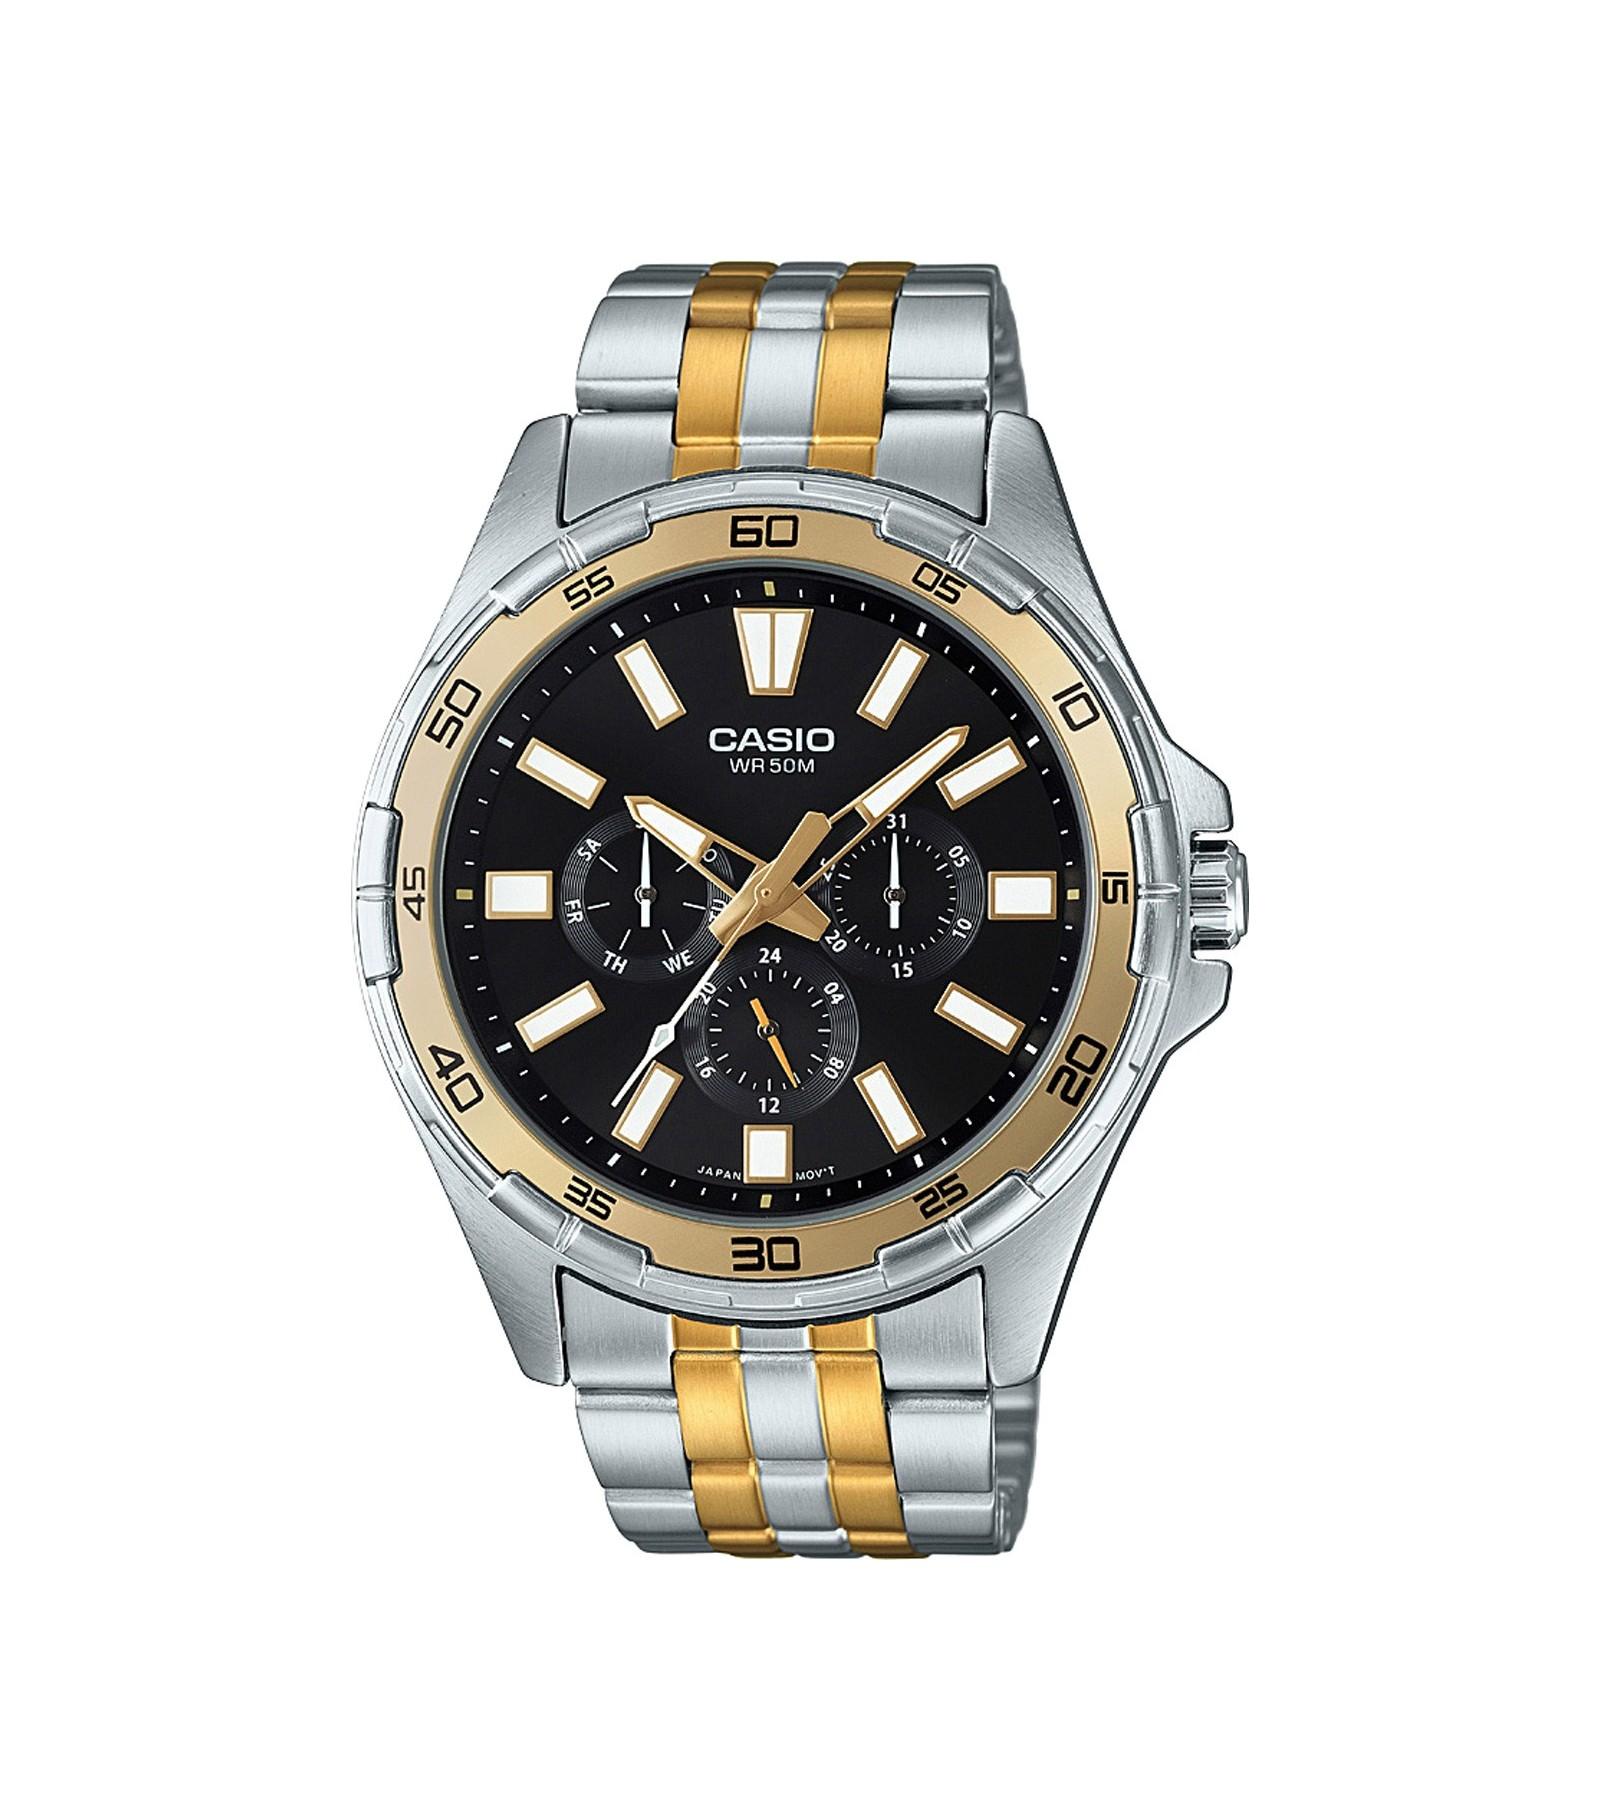 Casio часы сайт официальный